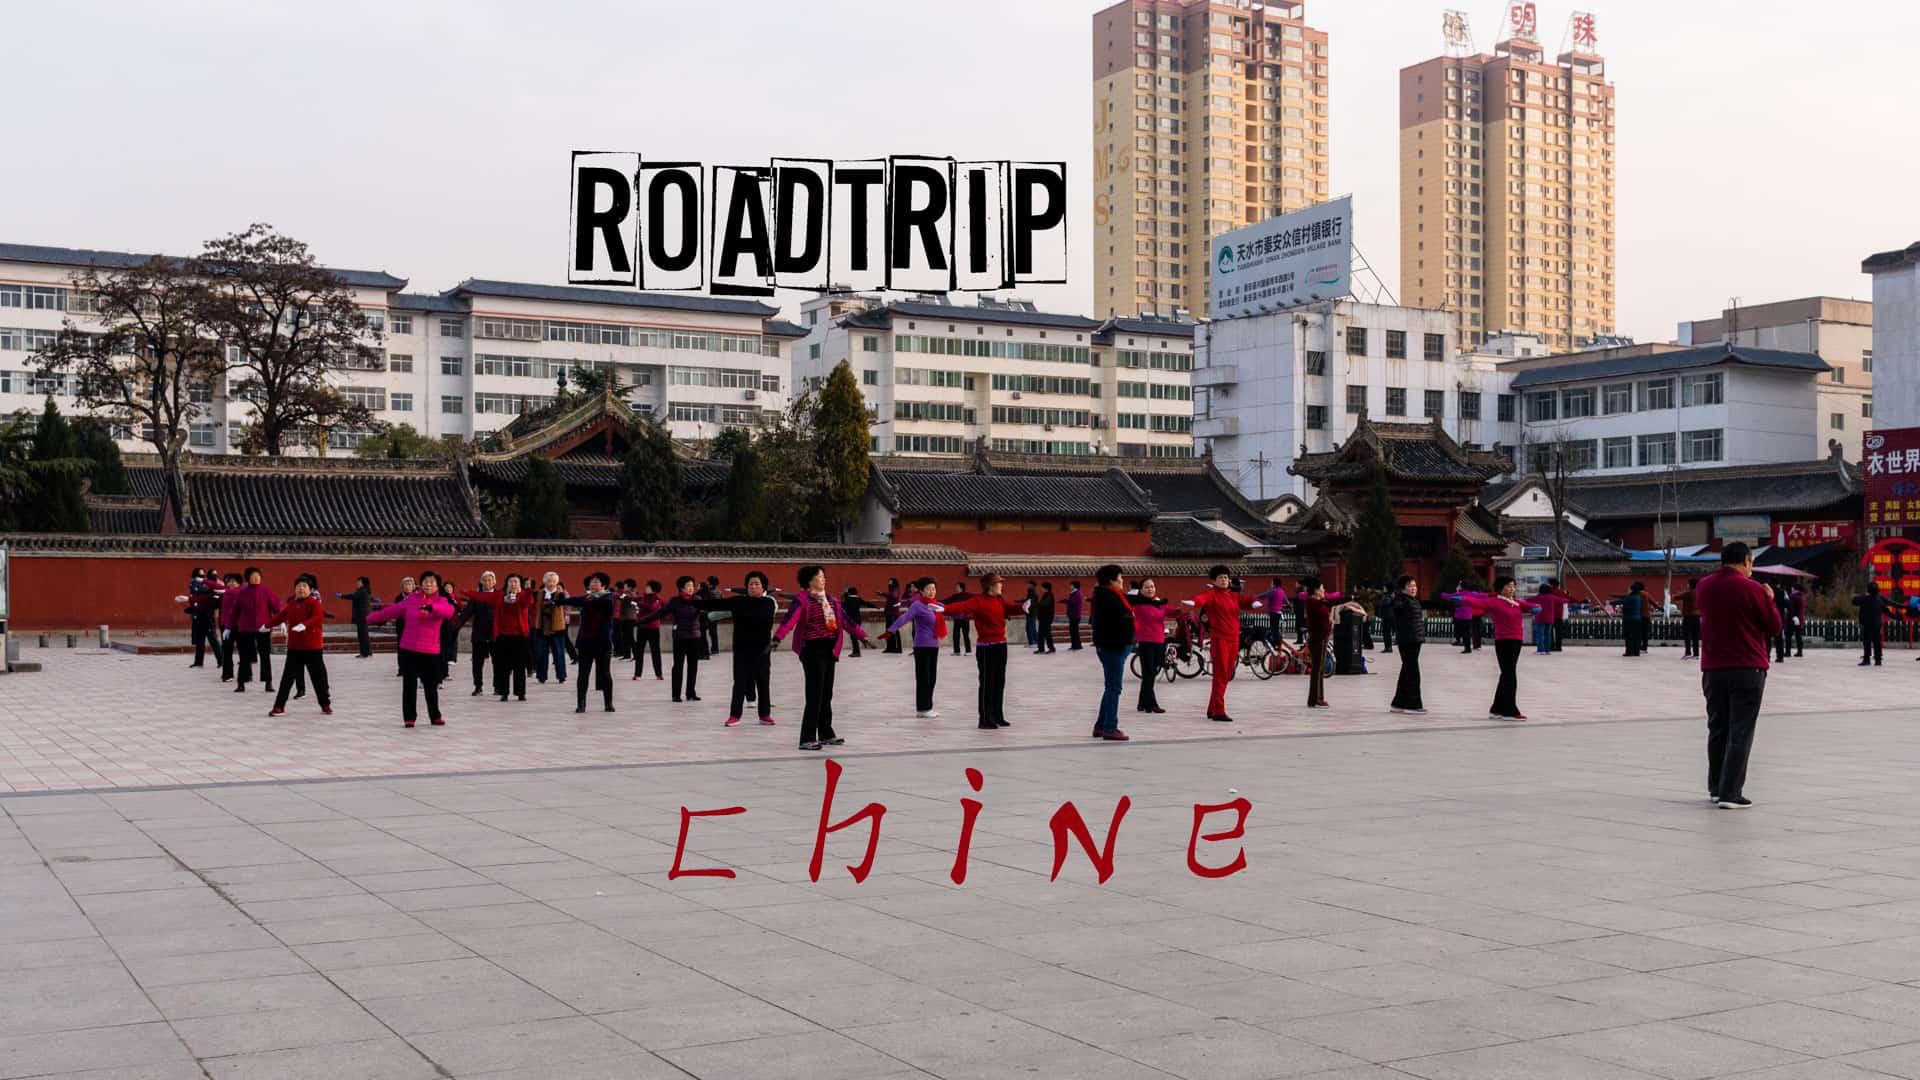 SerialHikers stop autostop world monde tour hitchhiking aventure adventure alternative travel voyage sans avion no fly china chine roadtrip newsletter